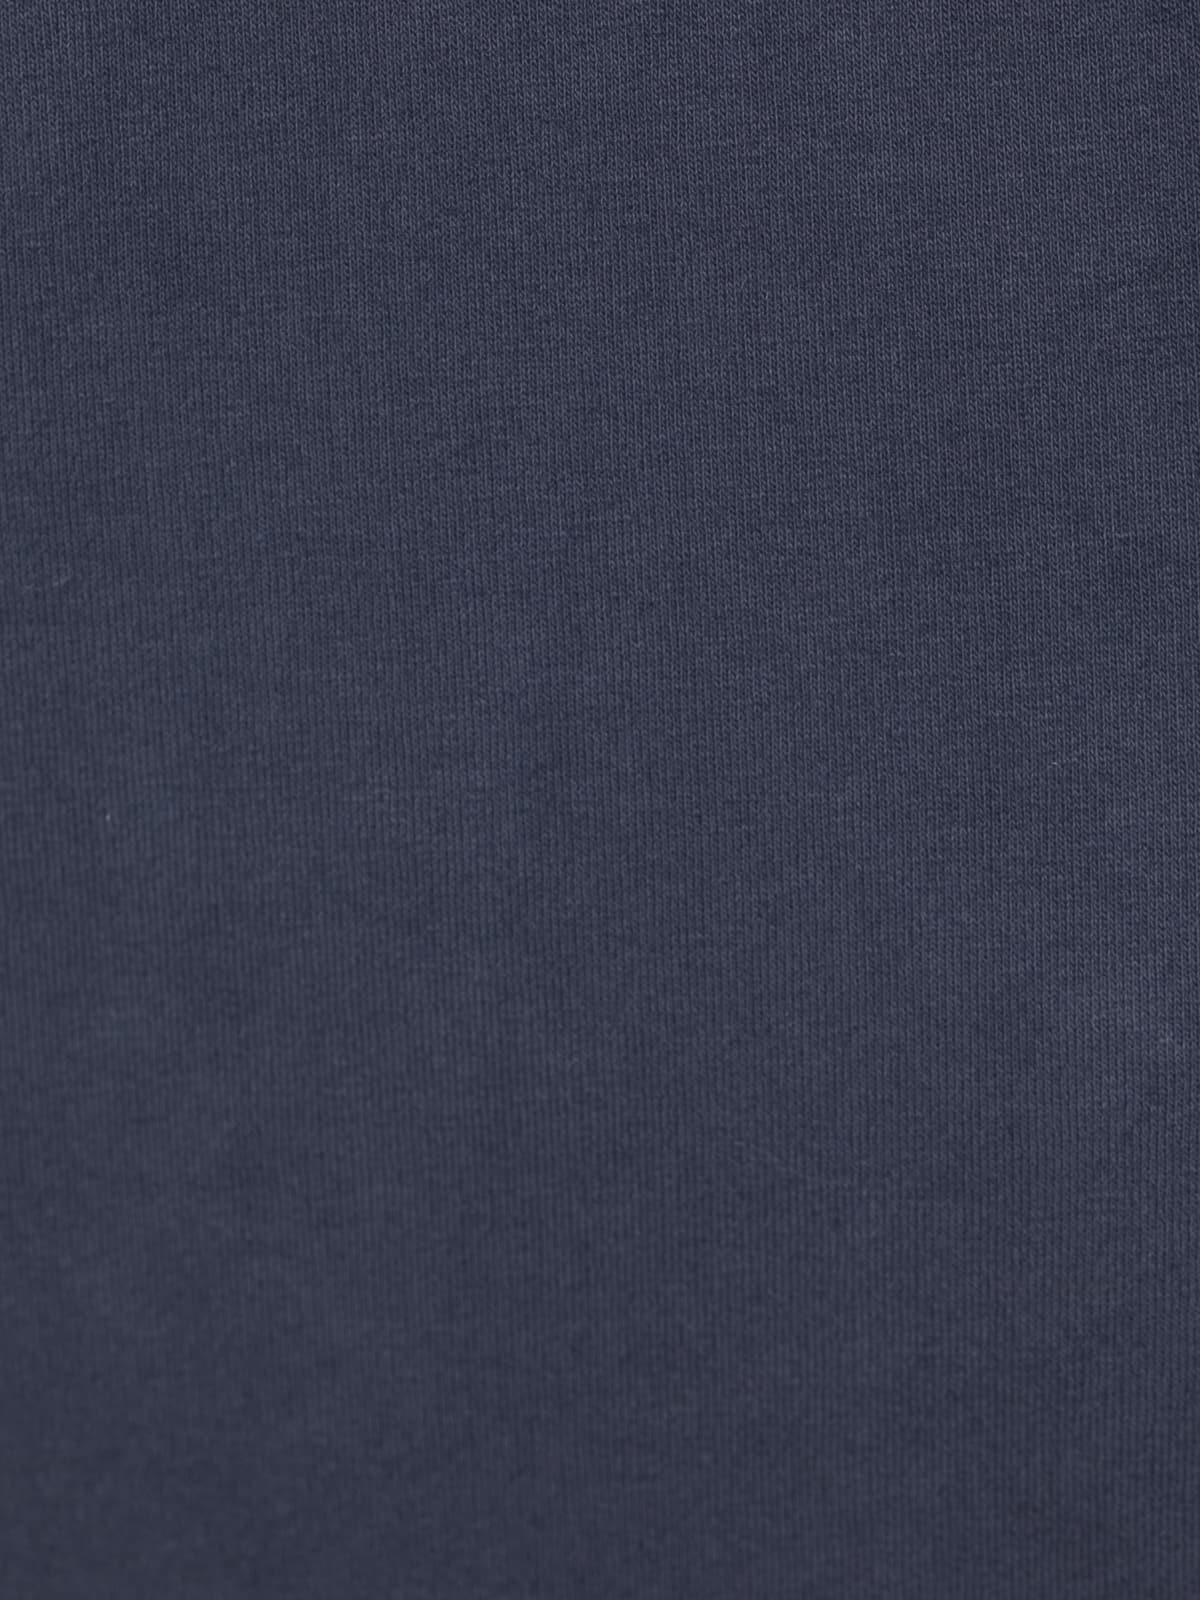 Chaqueta mujer casual larga Azul Marino